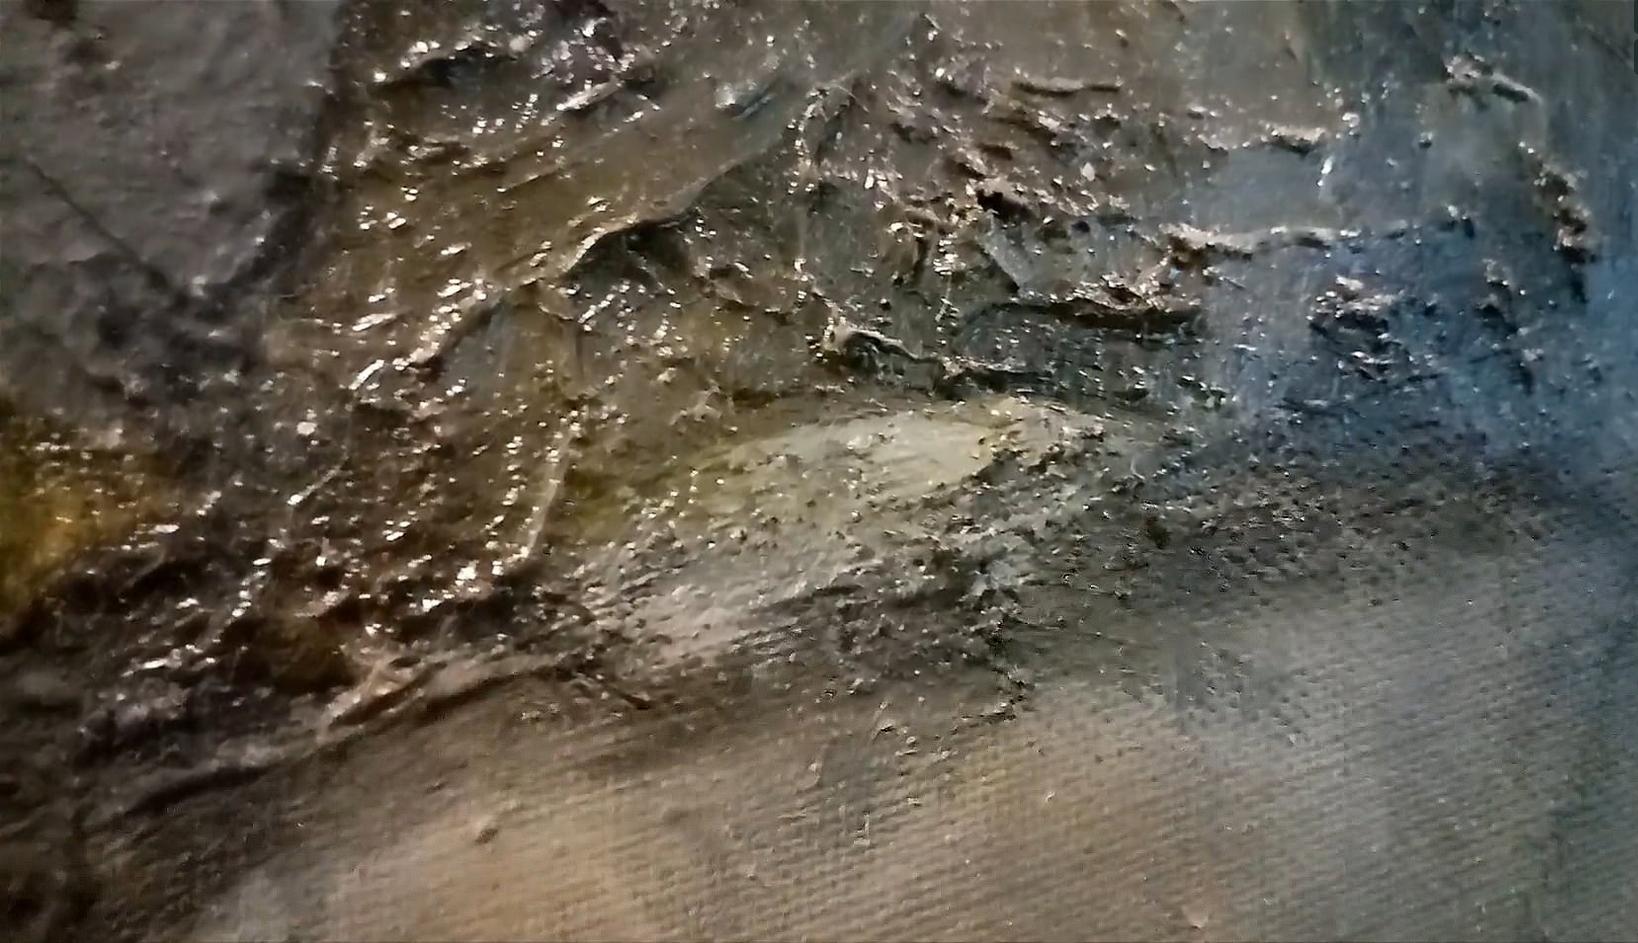 JULIOS (serie pictórica) (2020) - Andrea Garay